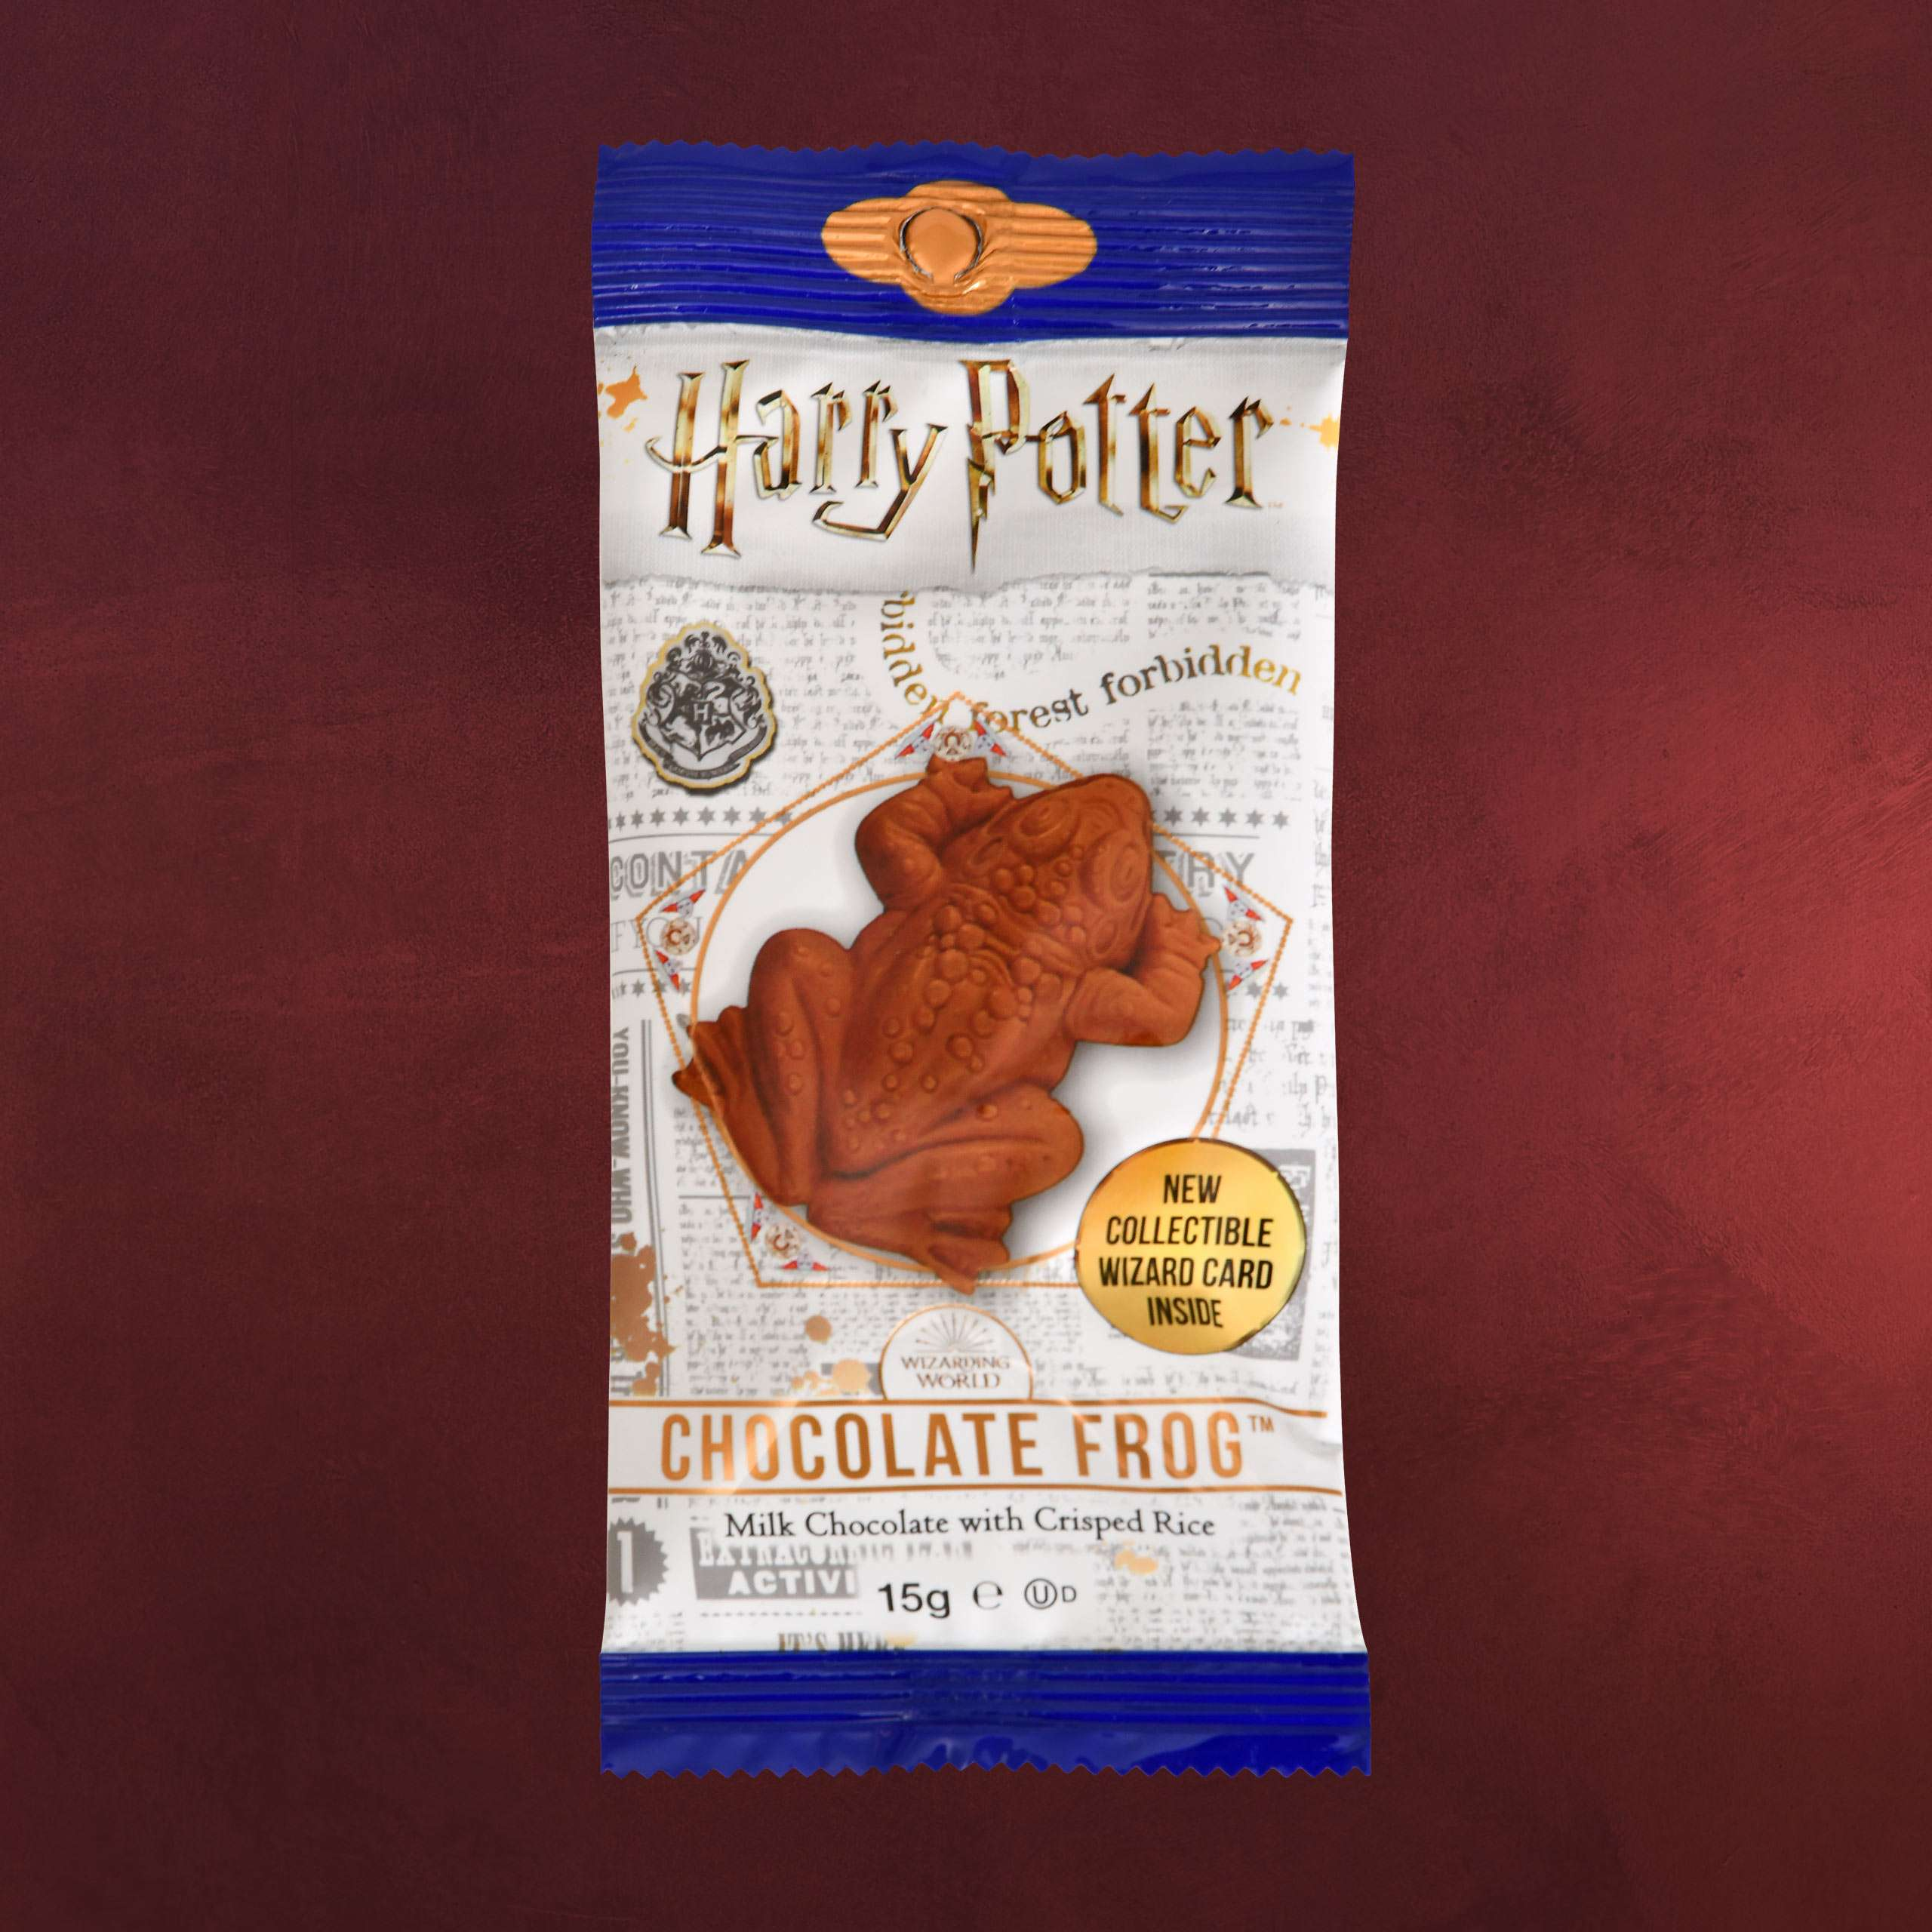 15g Schokofrosch inkl Harry Potter Sammelkarte